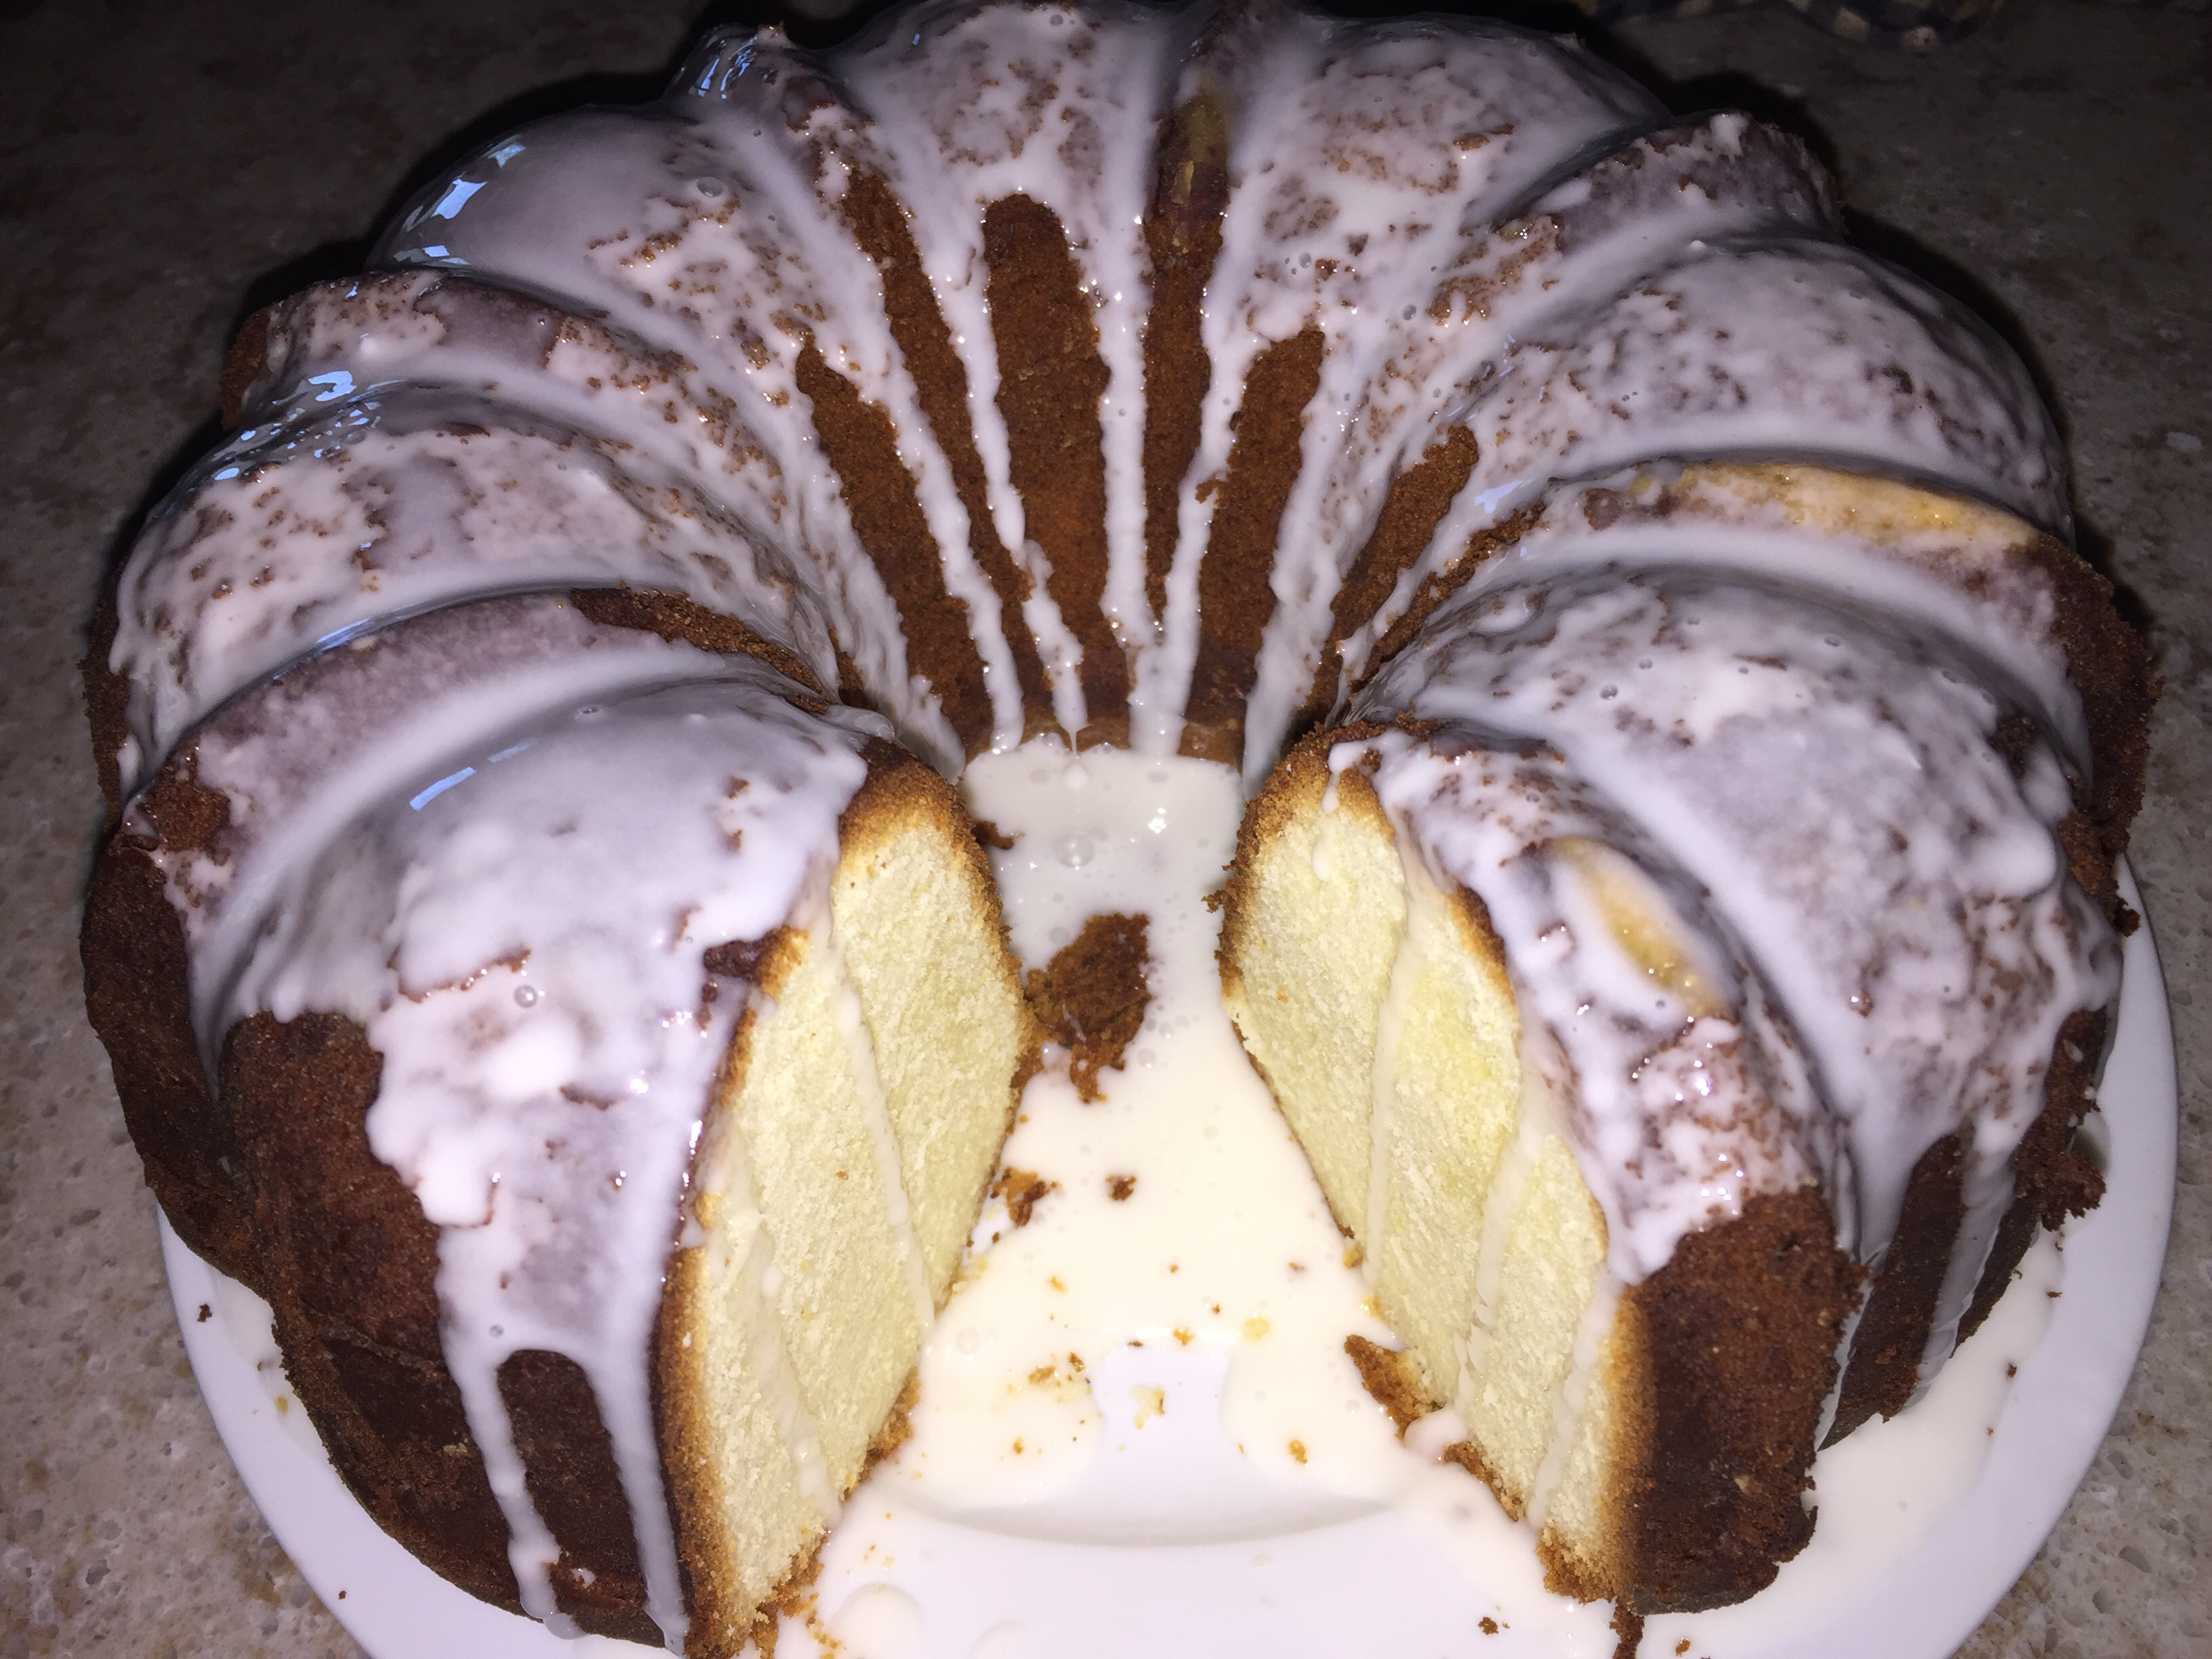 Yellow Pound Cake ItalianGrl